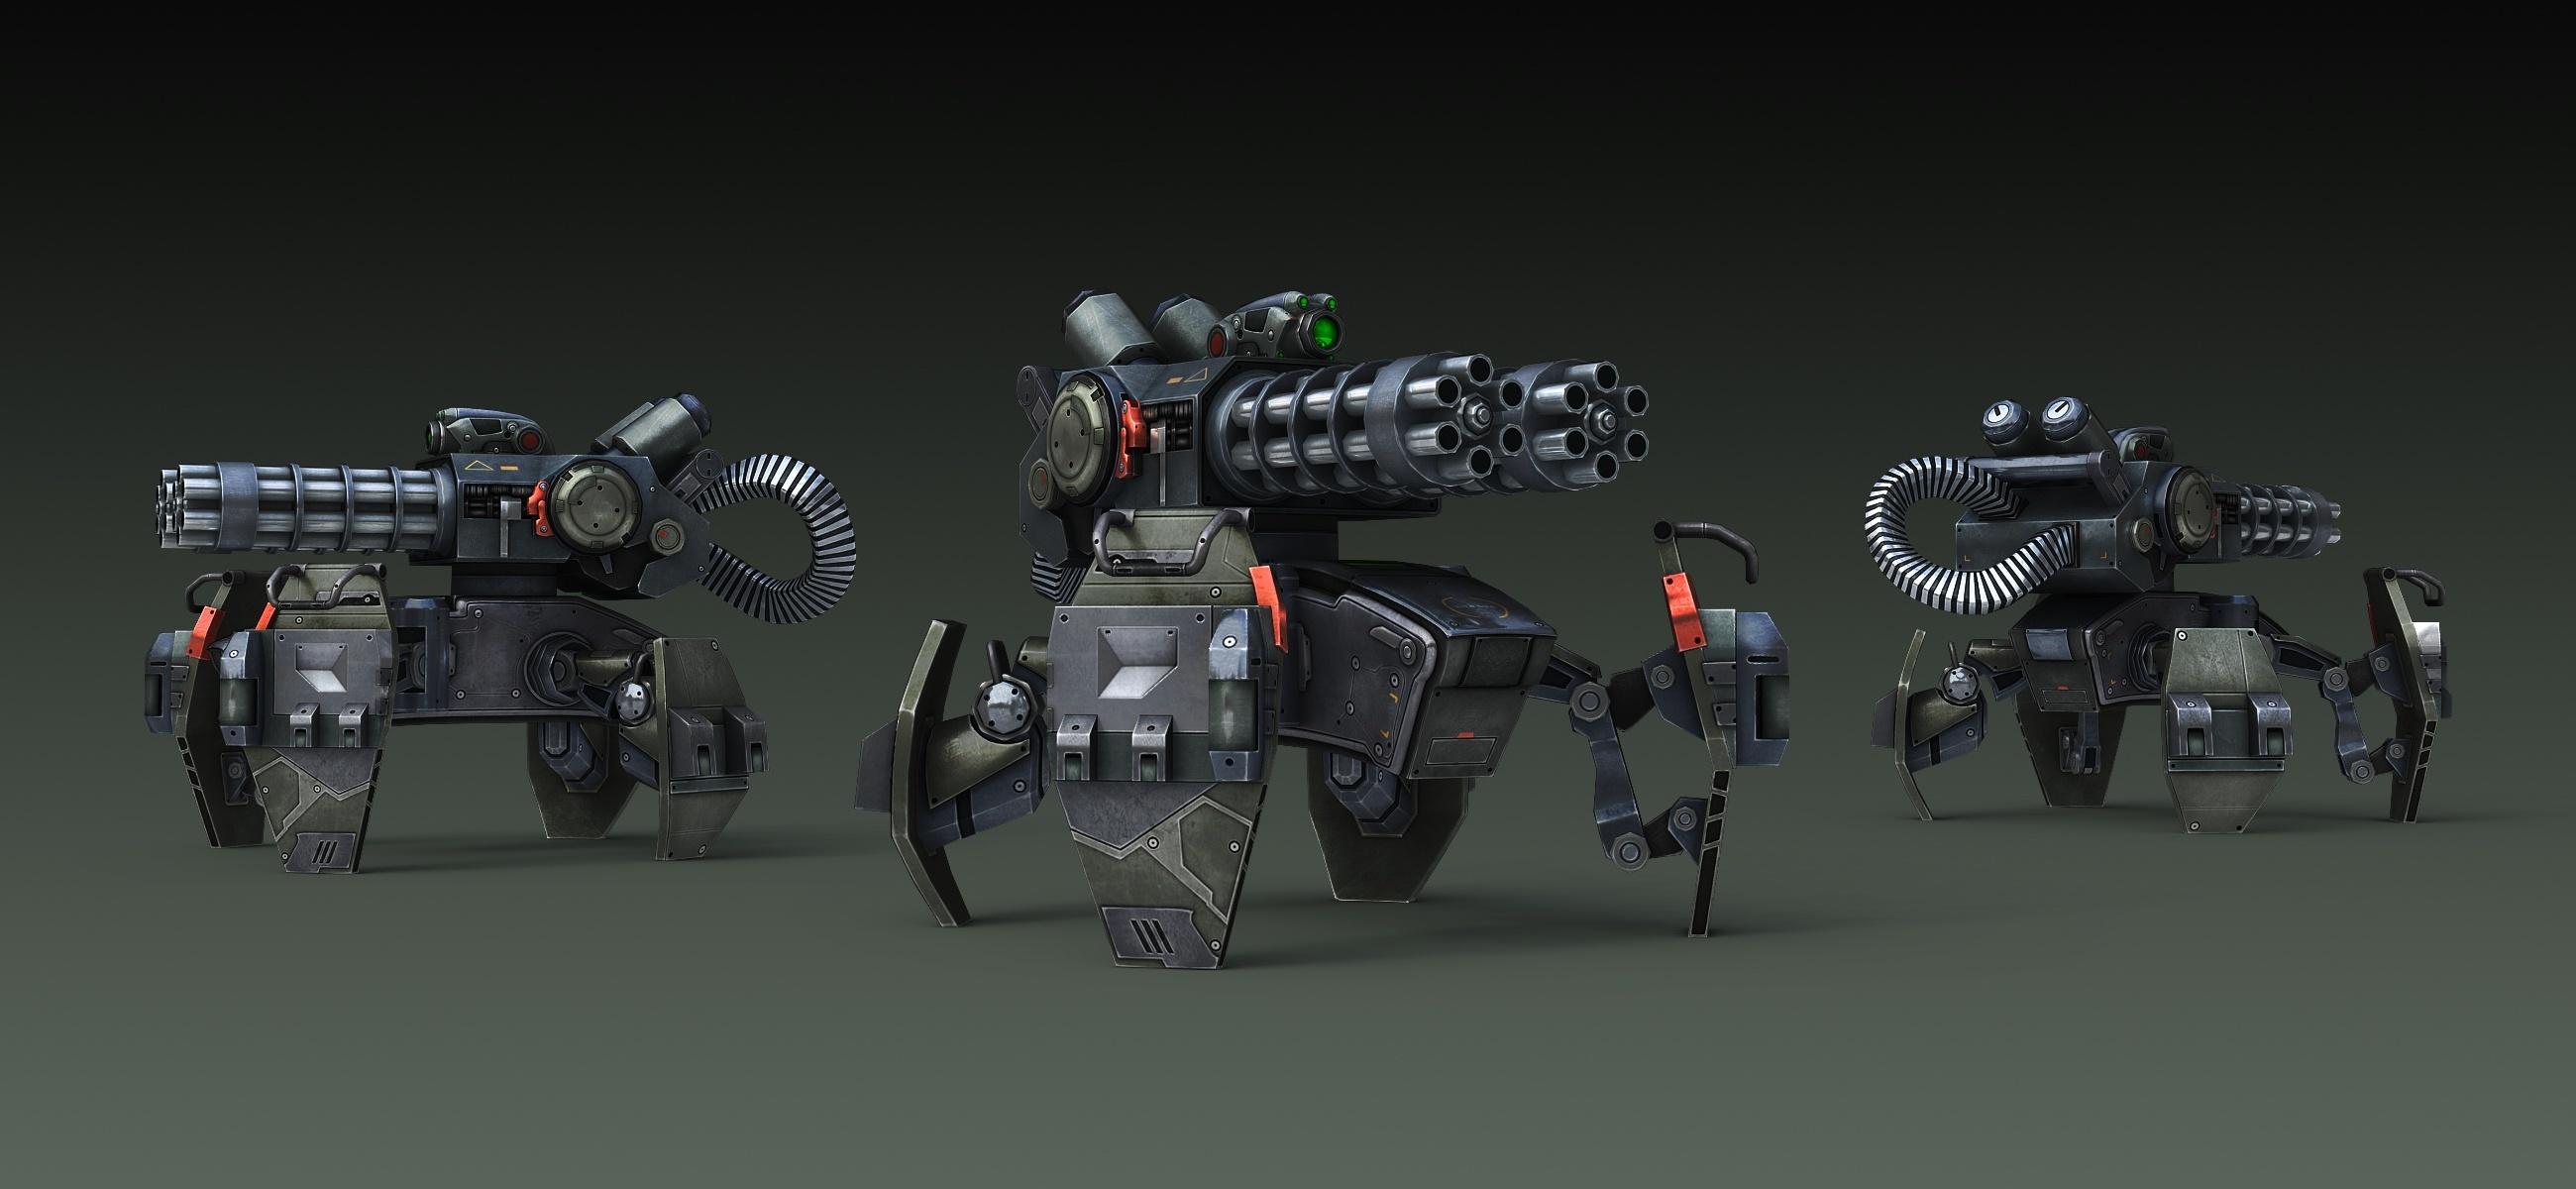 Hydra Turret Rendering